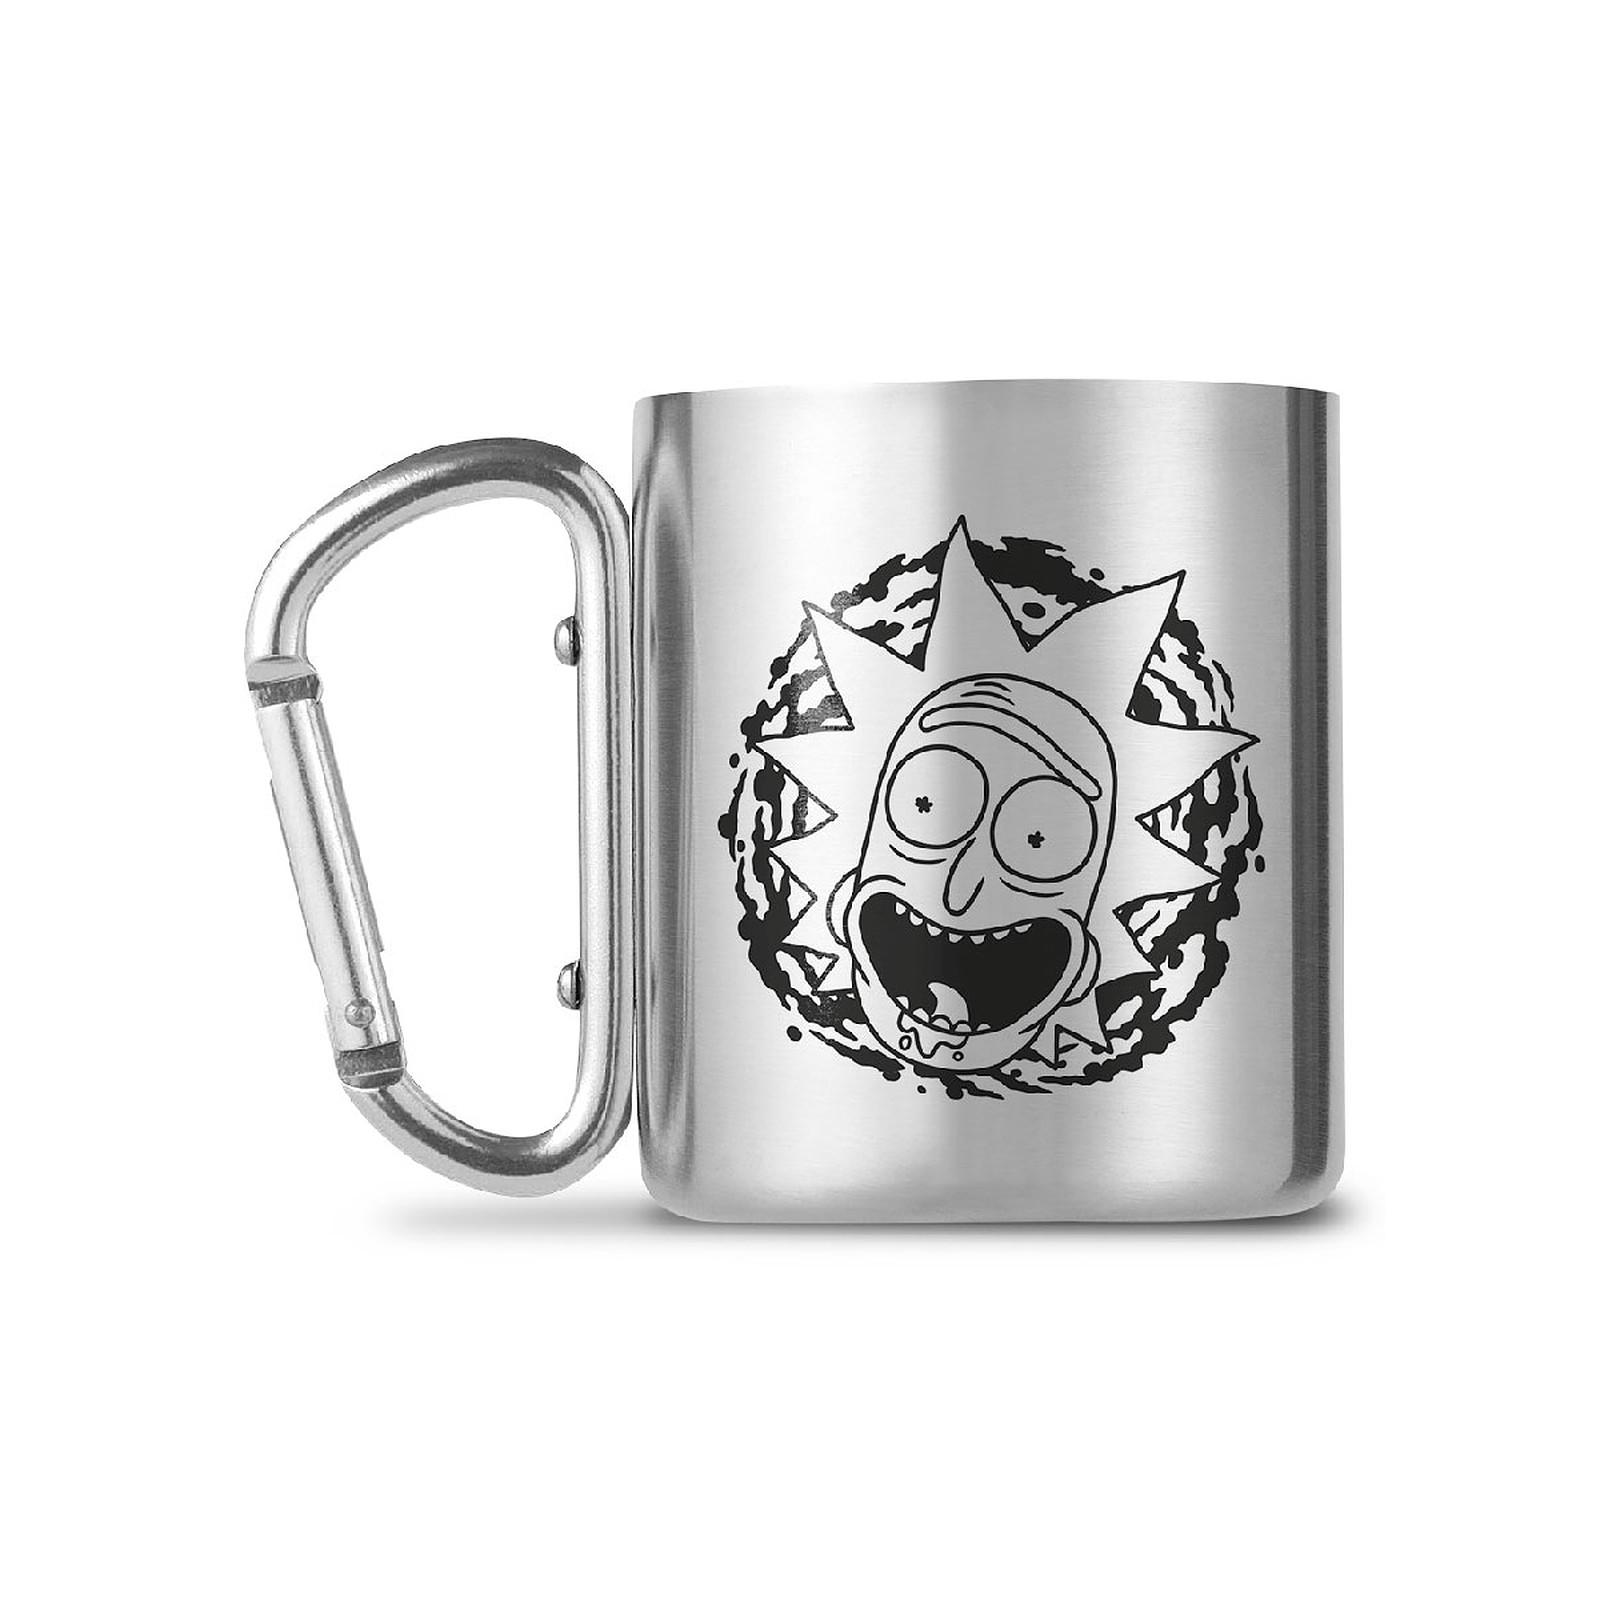 Rick et Morty - Mug Carabiner Rick and Morty